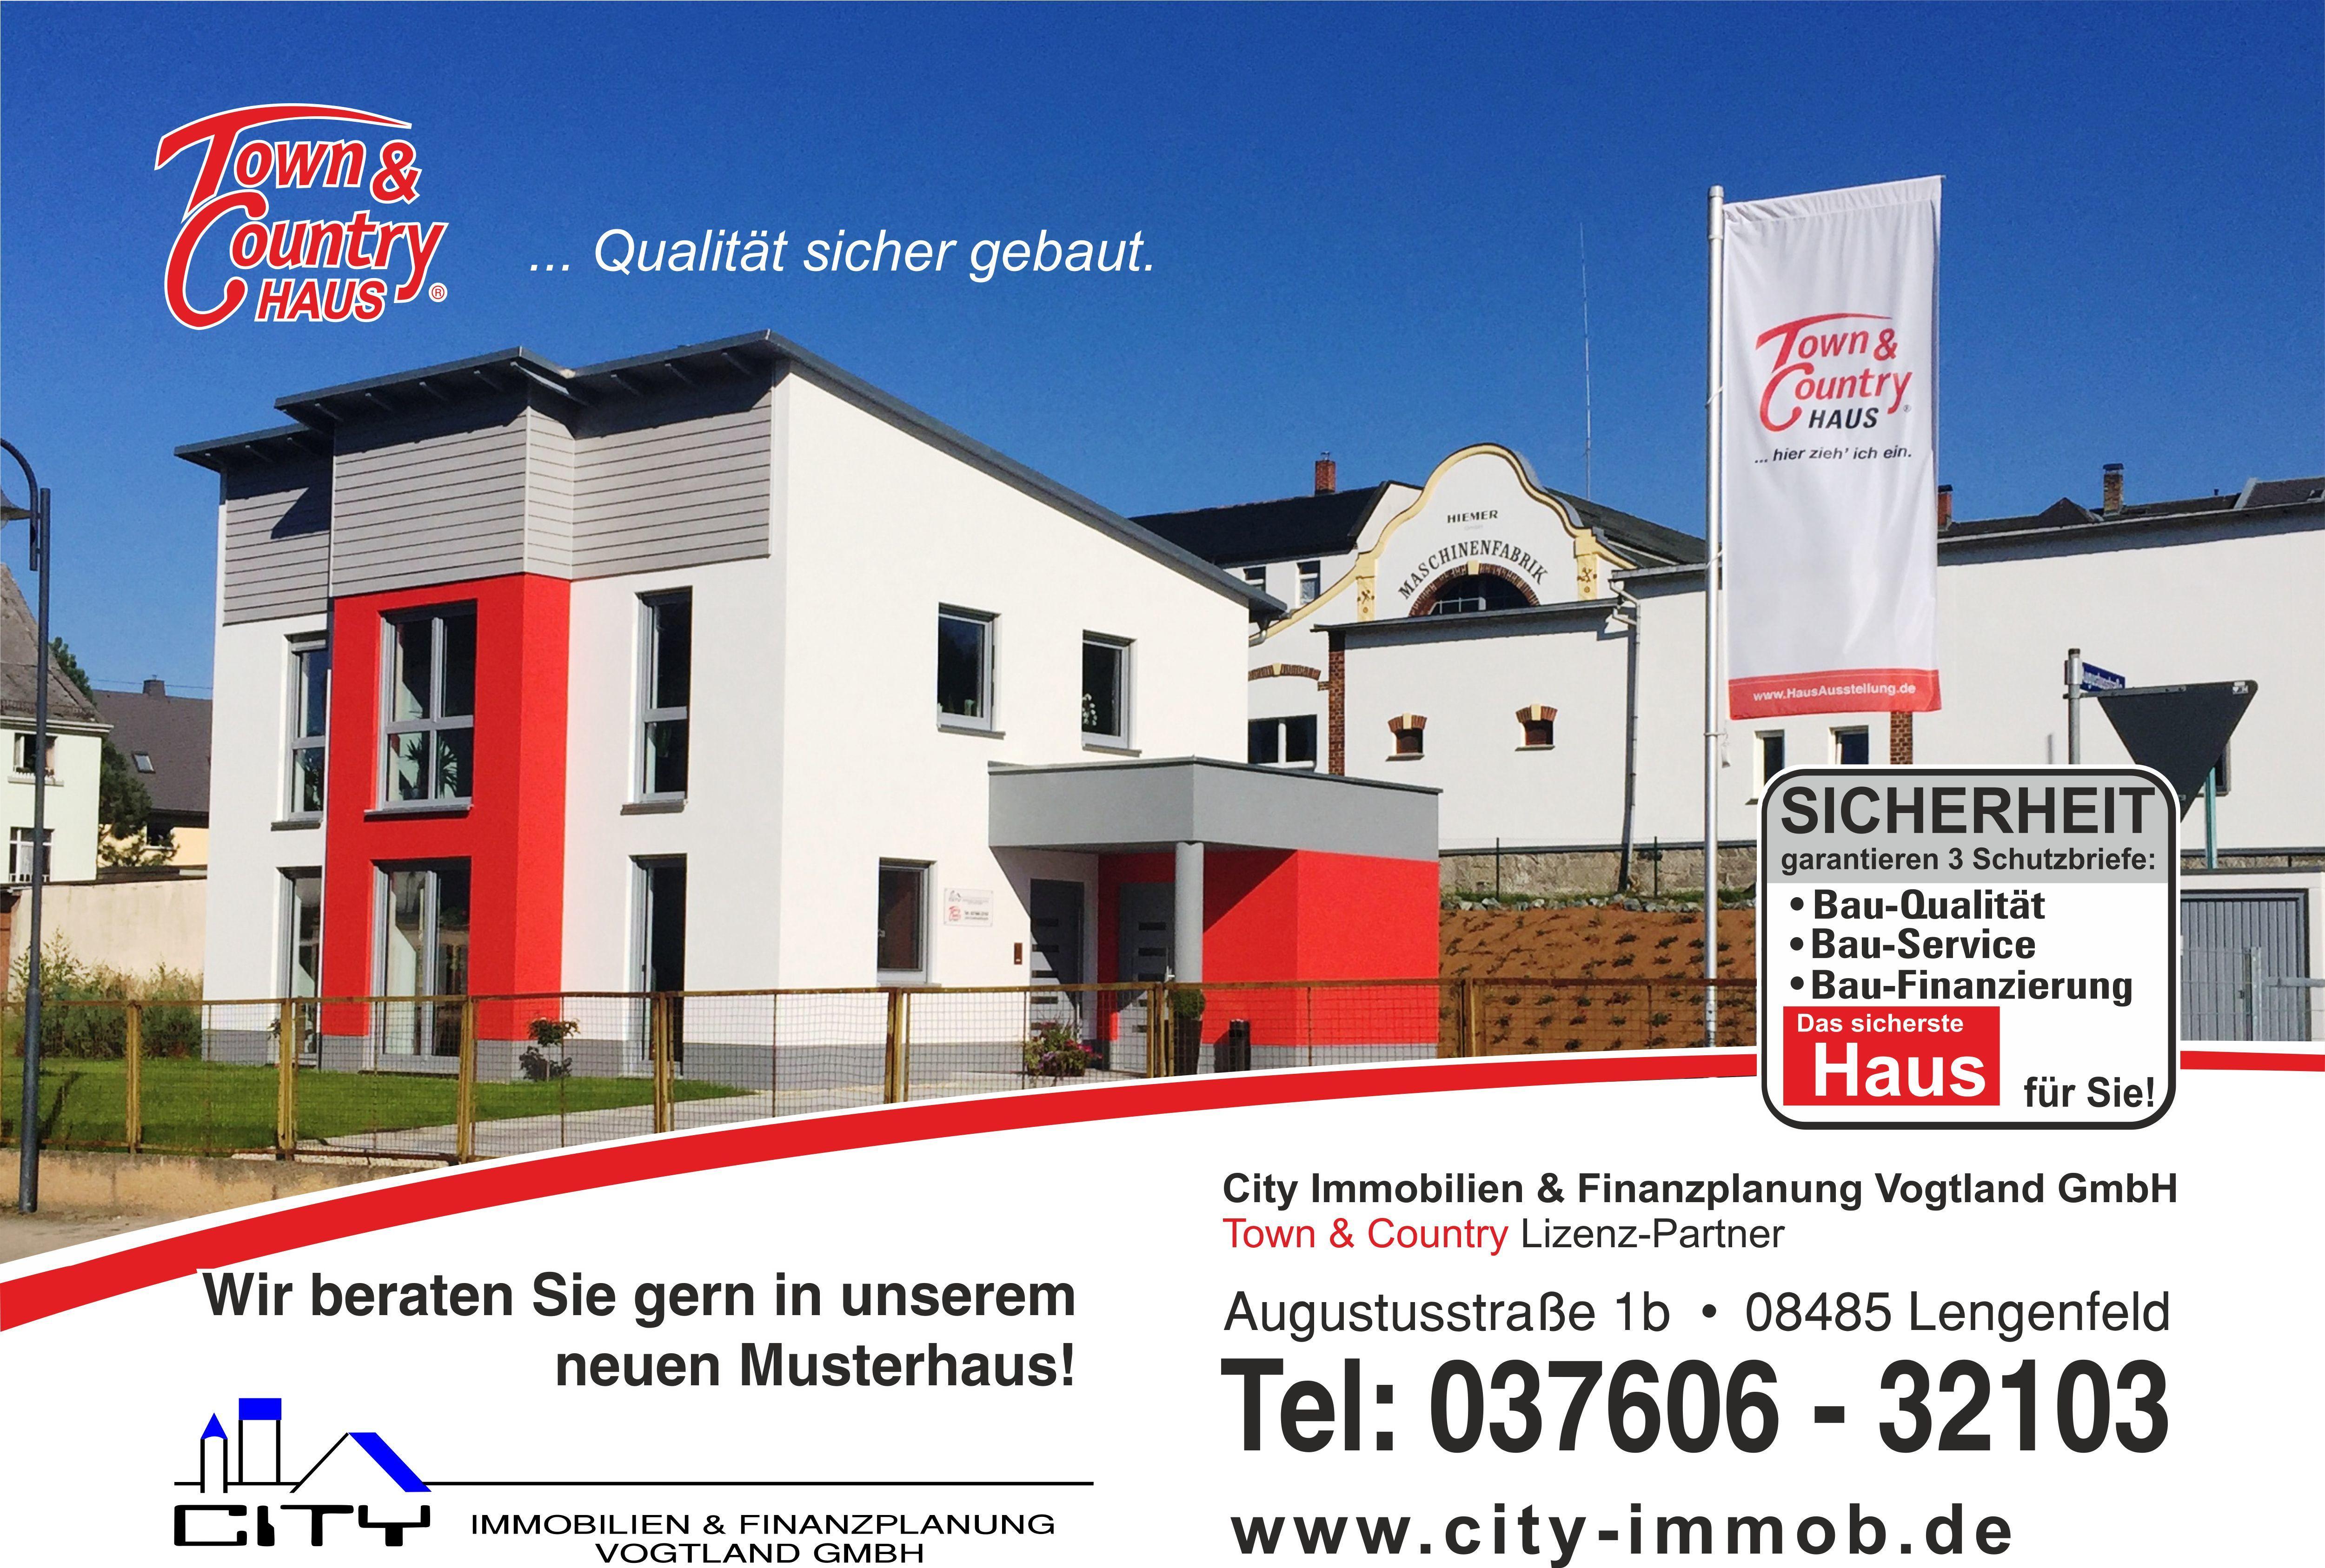 city immobilien finanzplanung vogtland gmbh immobilien in lengenfeld augustusstra e 1 b. Black Bedroom Furniture Sets. Home Design Ideas